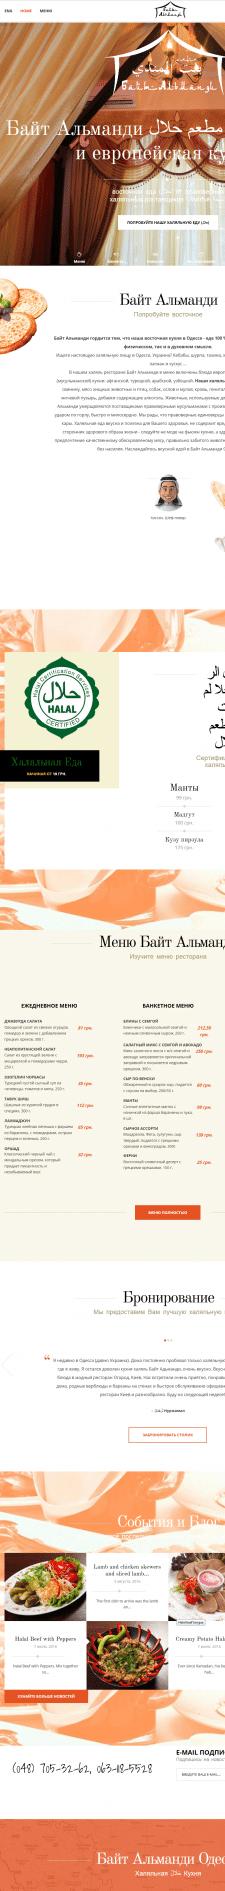 Вебсайт ресторана Байт Альманди - восточная кухня